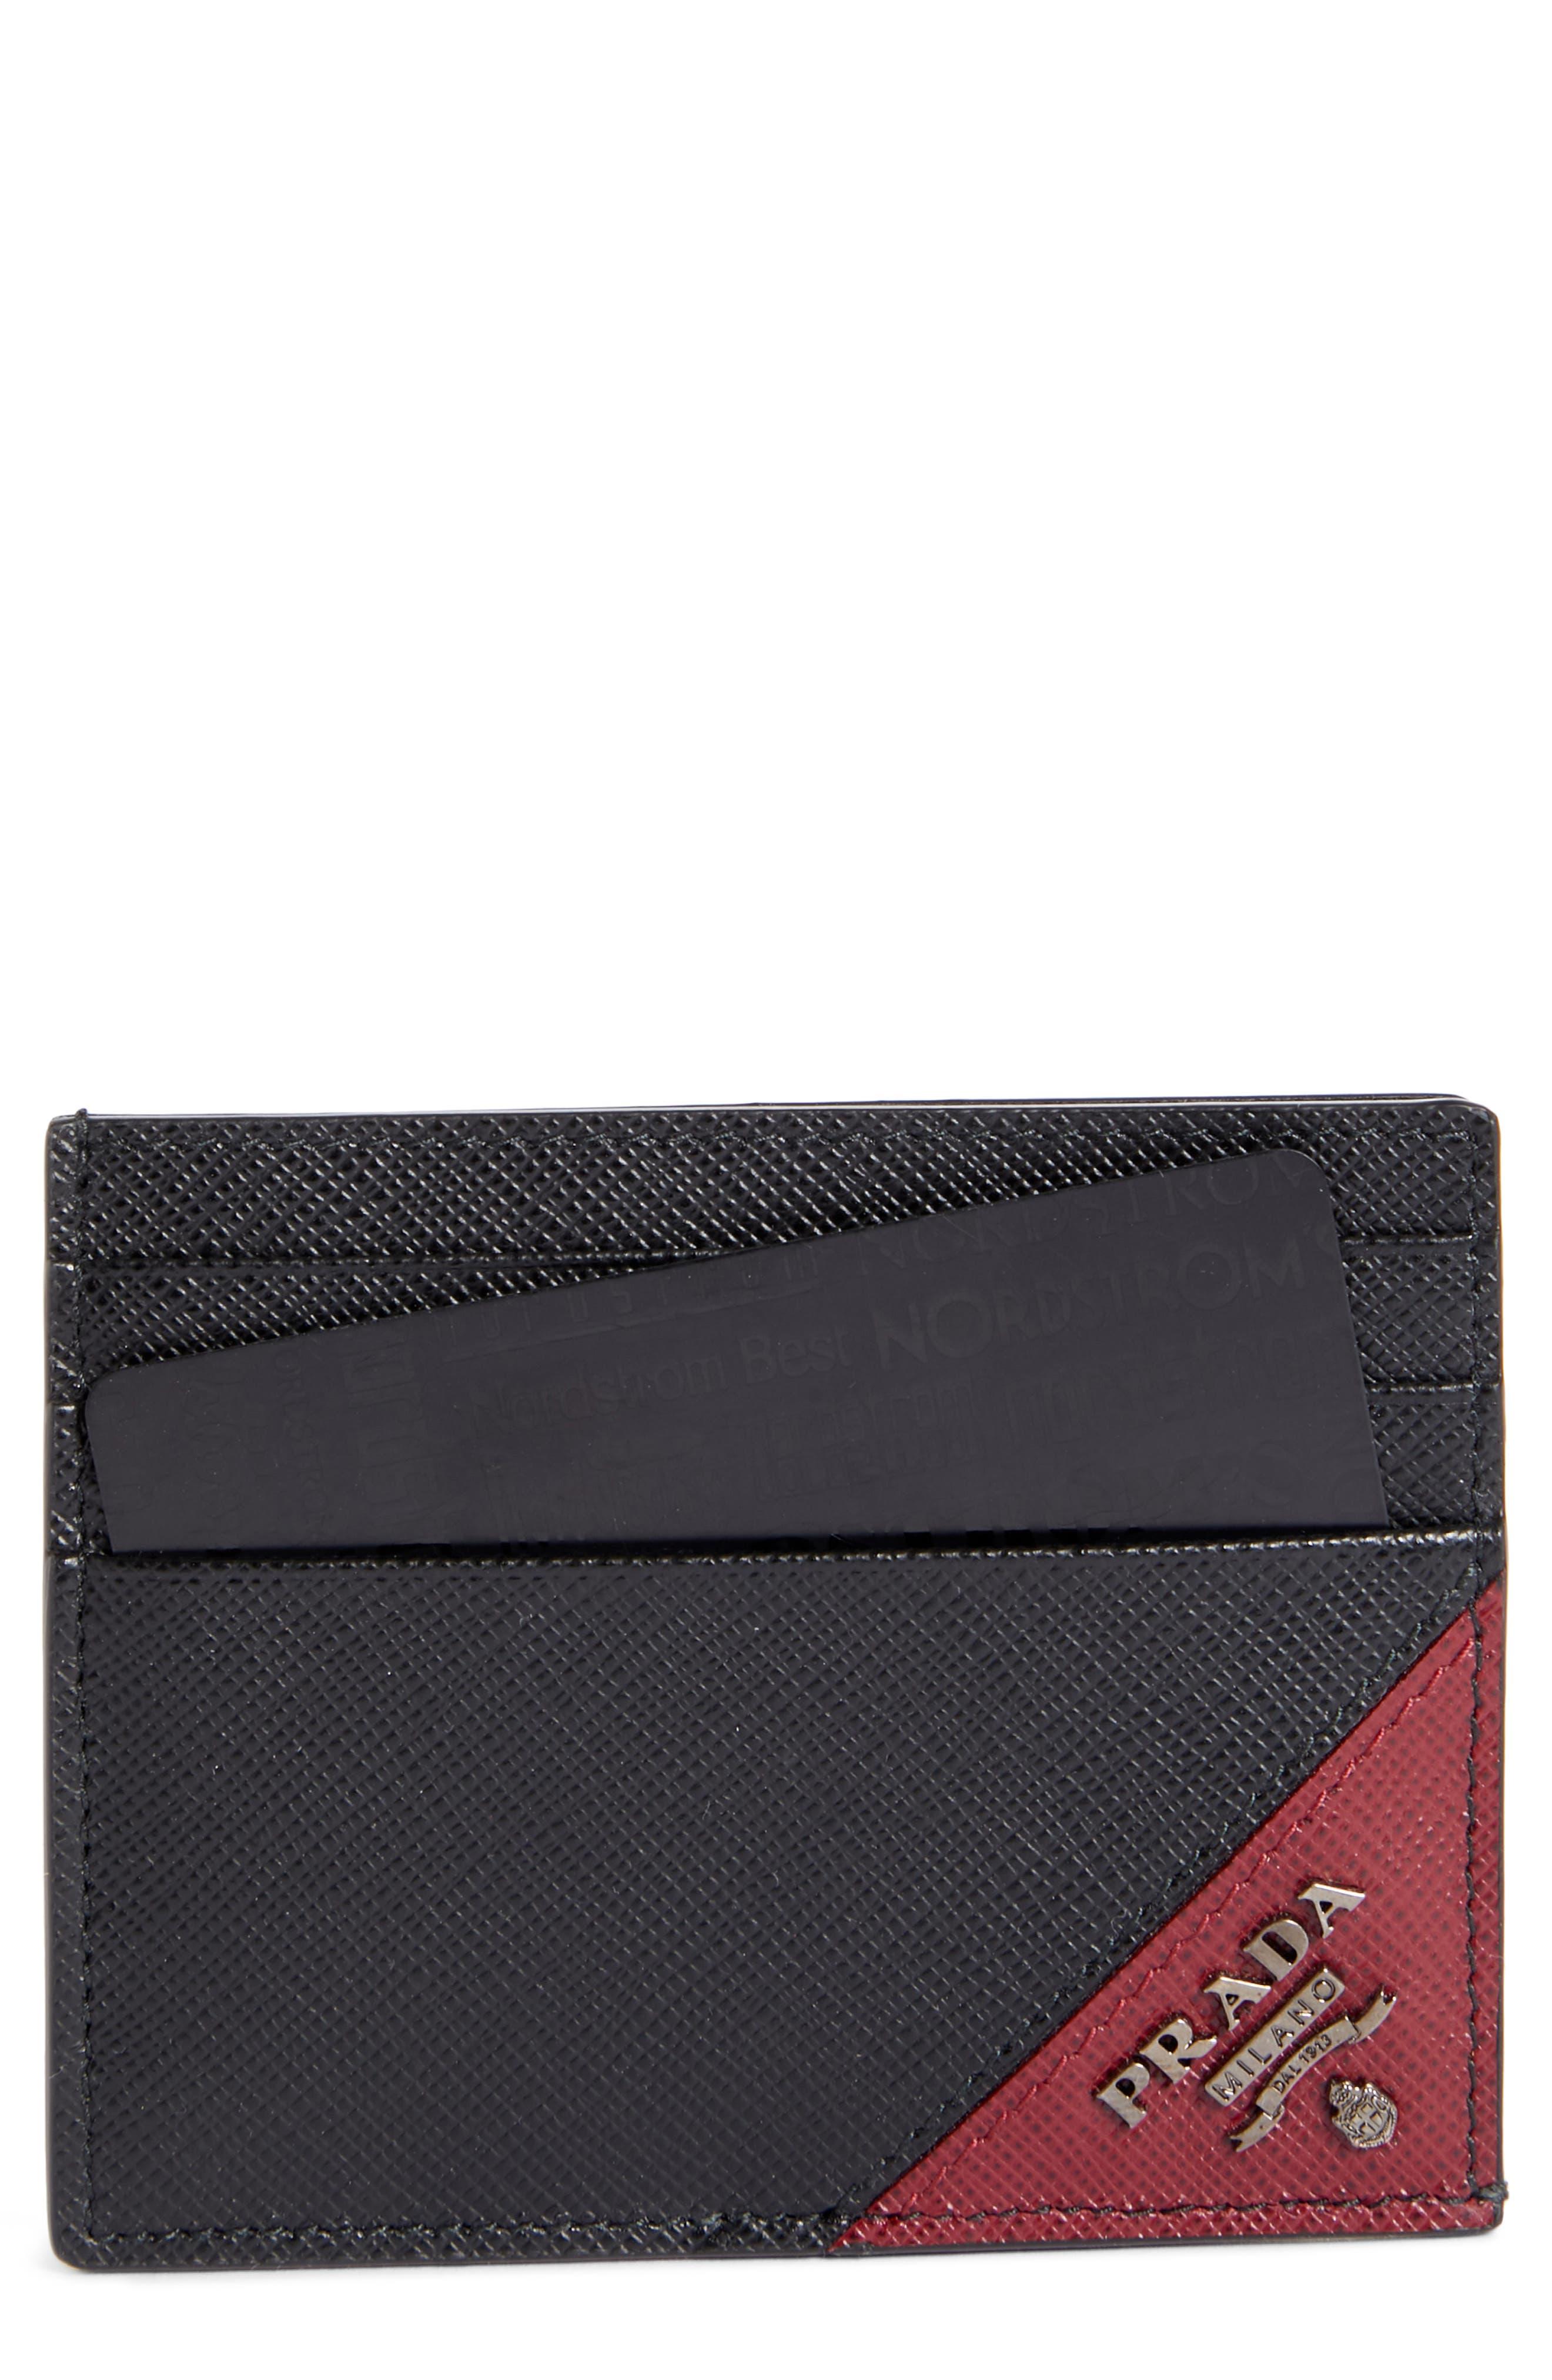 Saffiano Leather Card Case,                             Main thumbnail 1, color,                             NERO AND CERISE